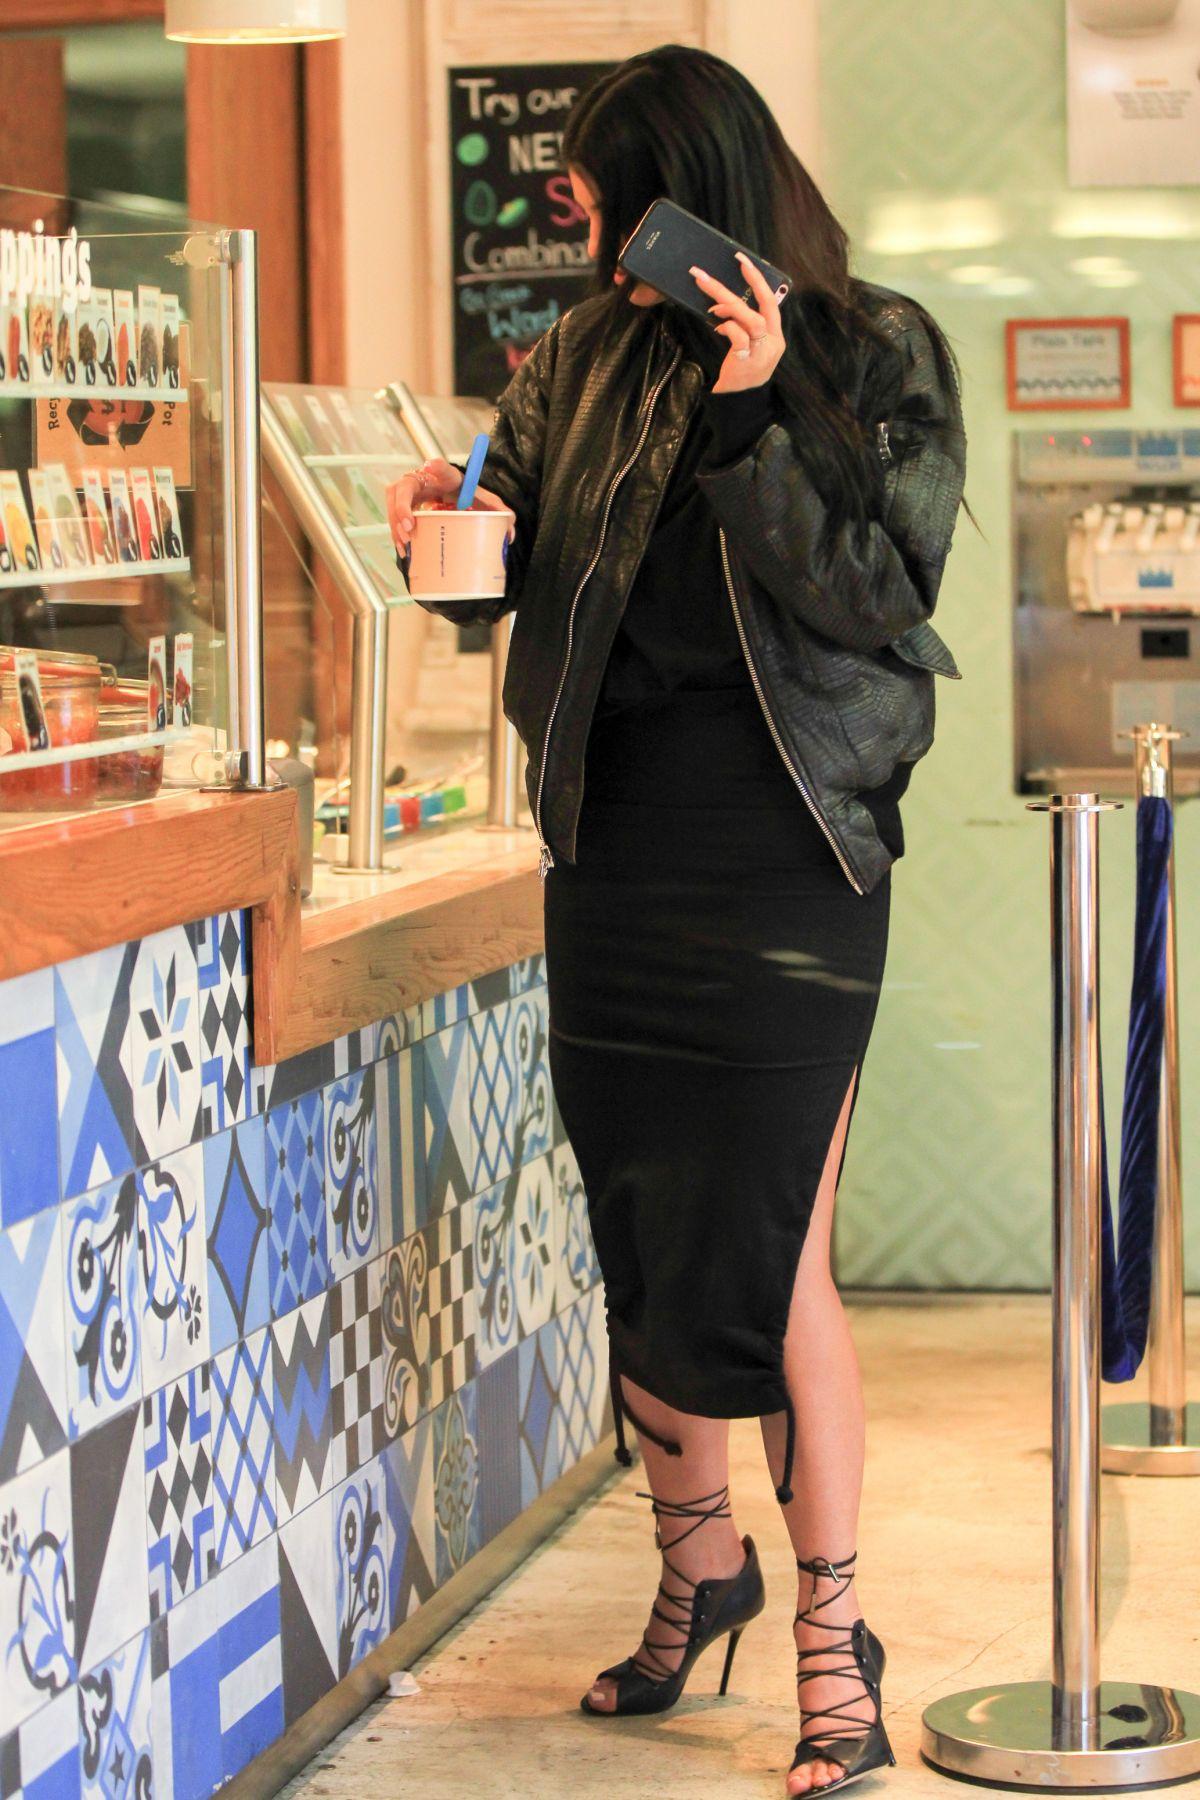 KYLIE JENNER at Yogurt at Go Greek in Beverly Hills 11/05/2015